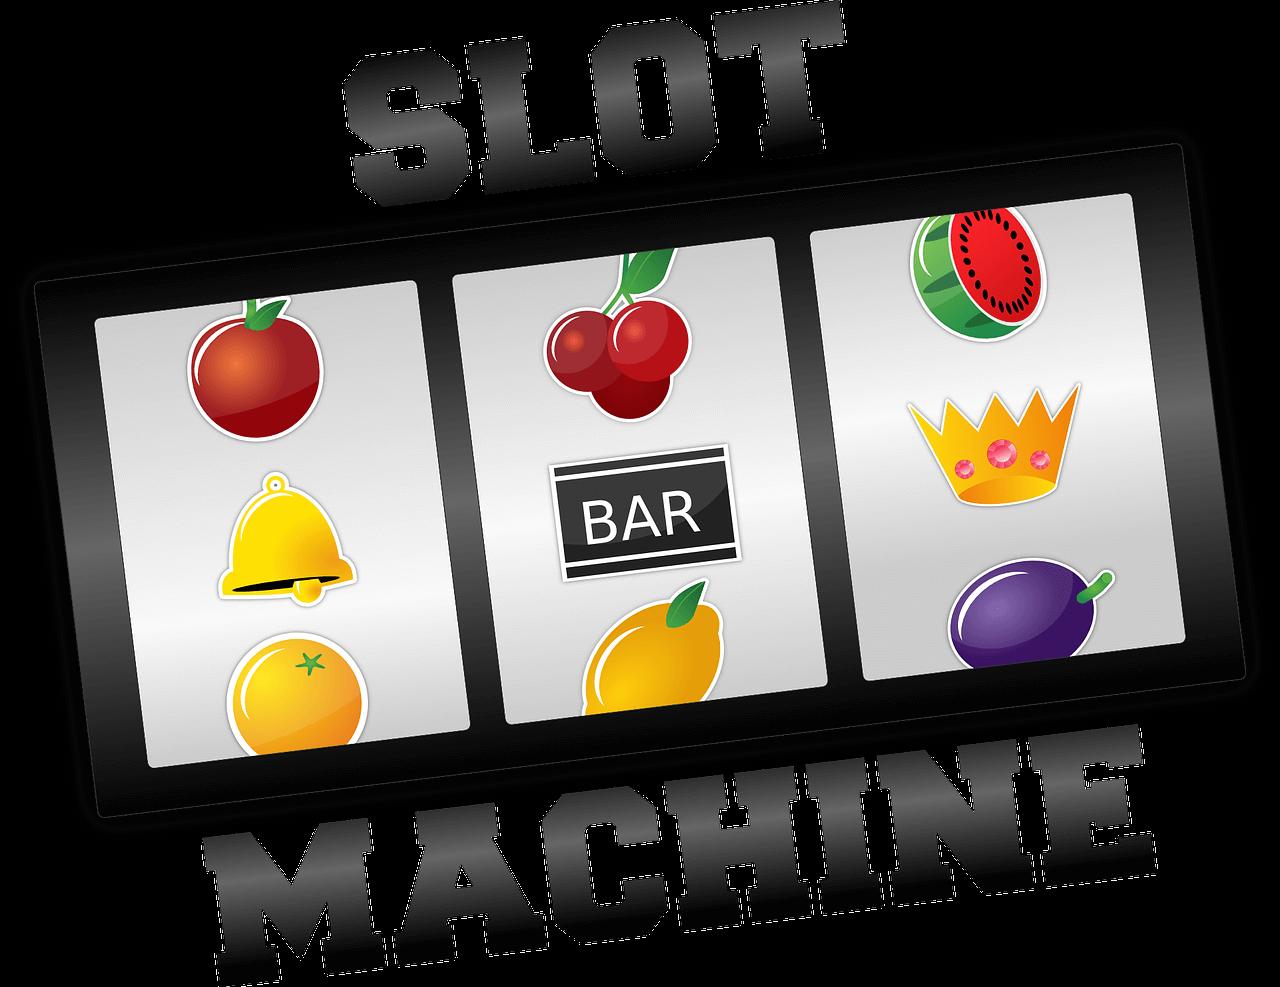 slot-machine-casino-fruits-gambling